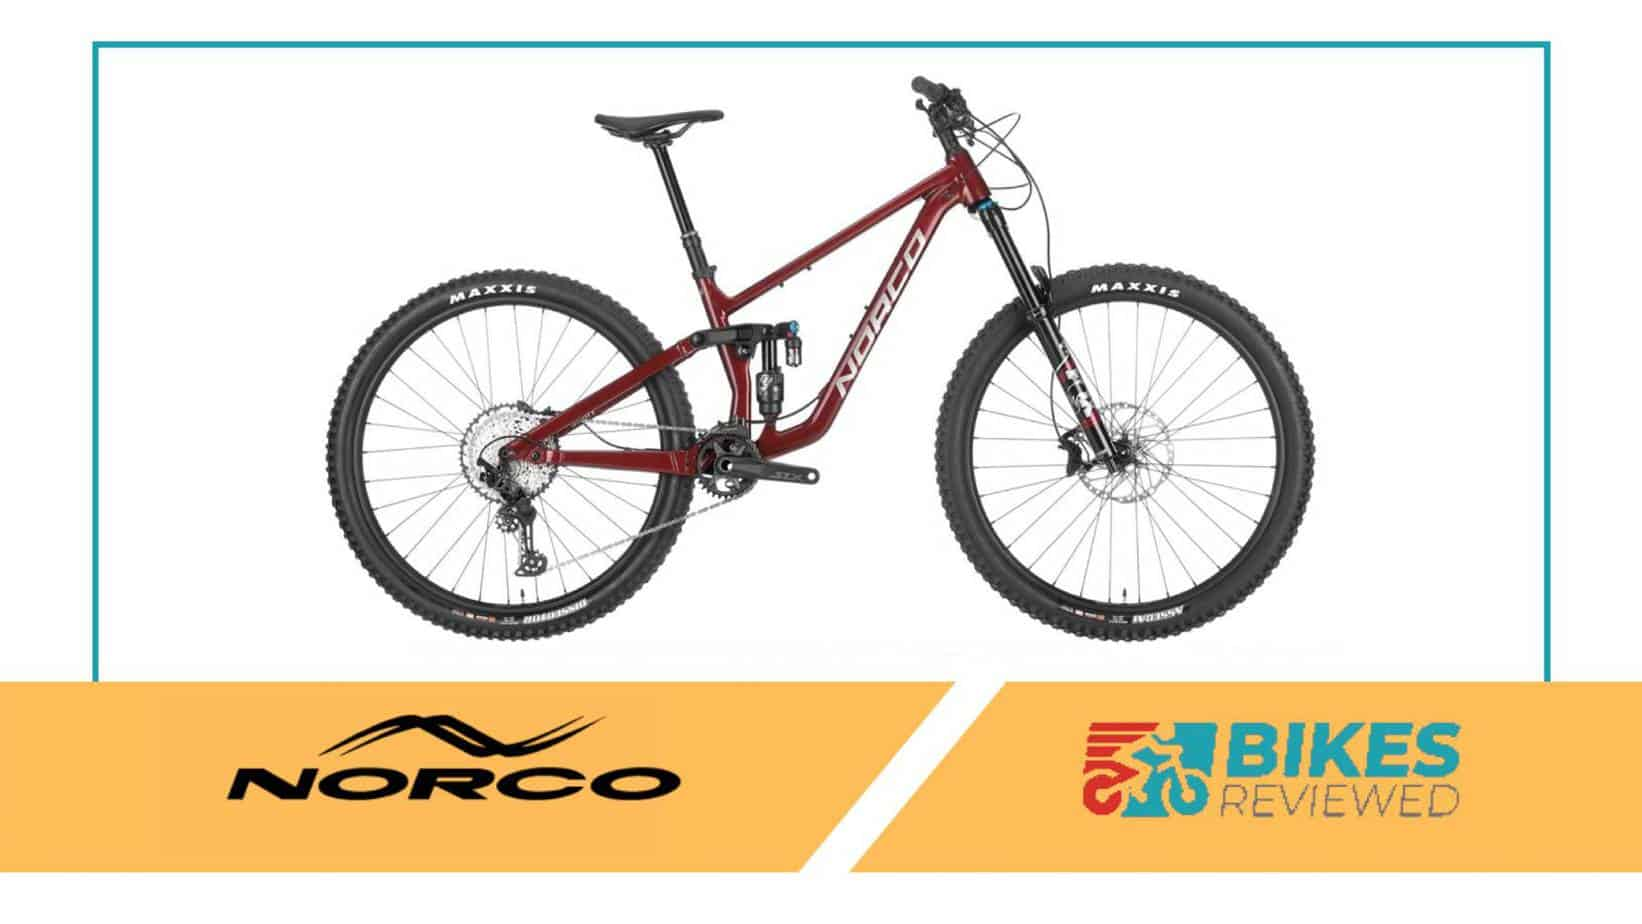 Norco Mountain Bike Brand